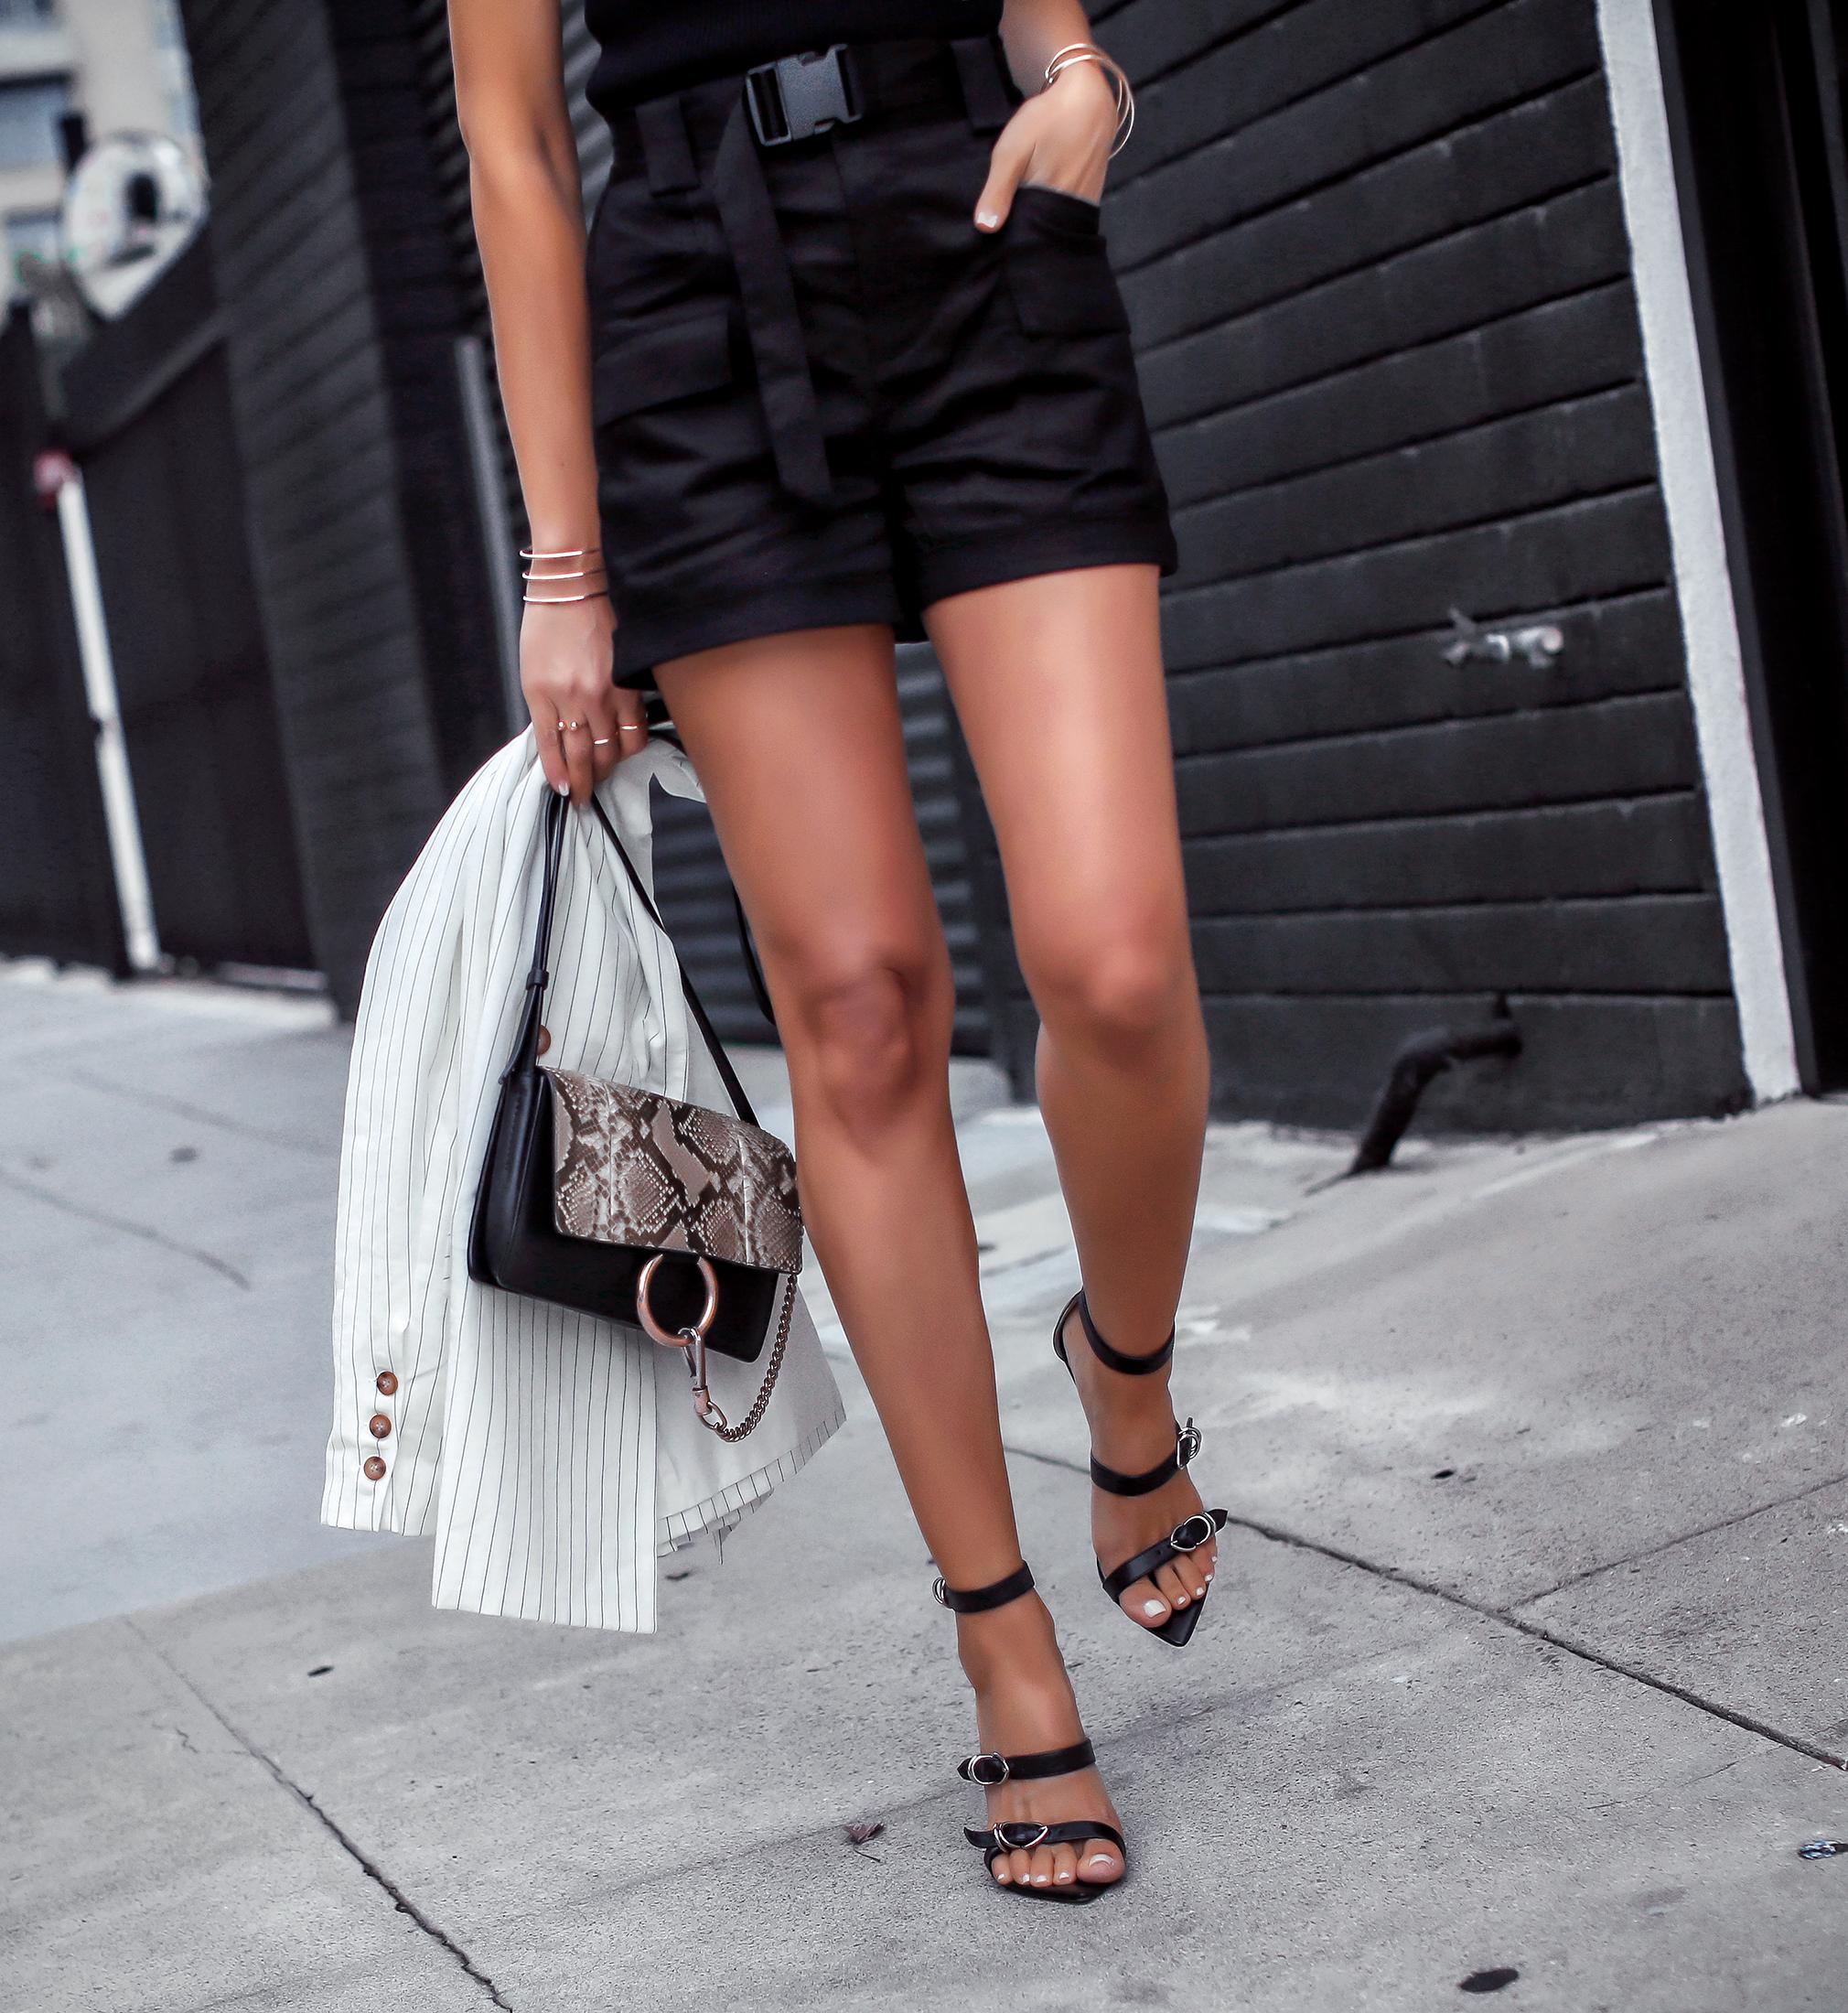 Woman Walking in Tony Bianco Stilletos Chloe Nile Bag